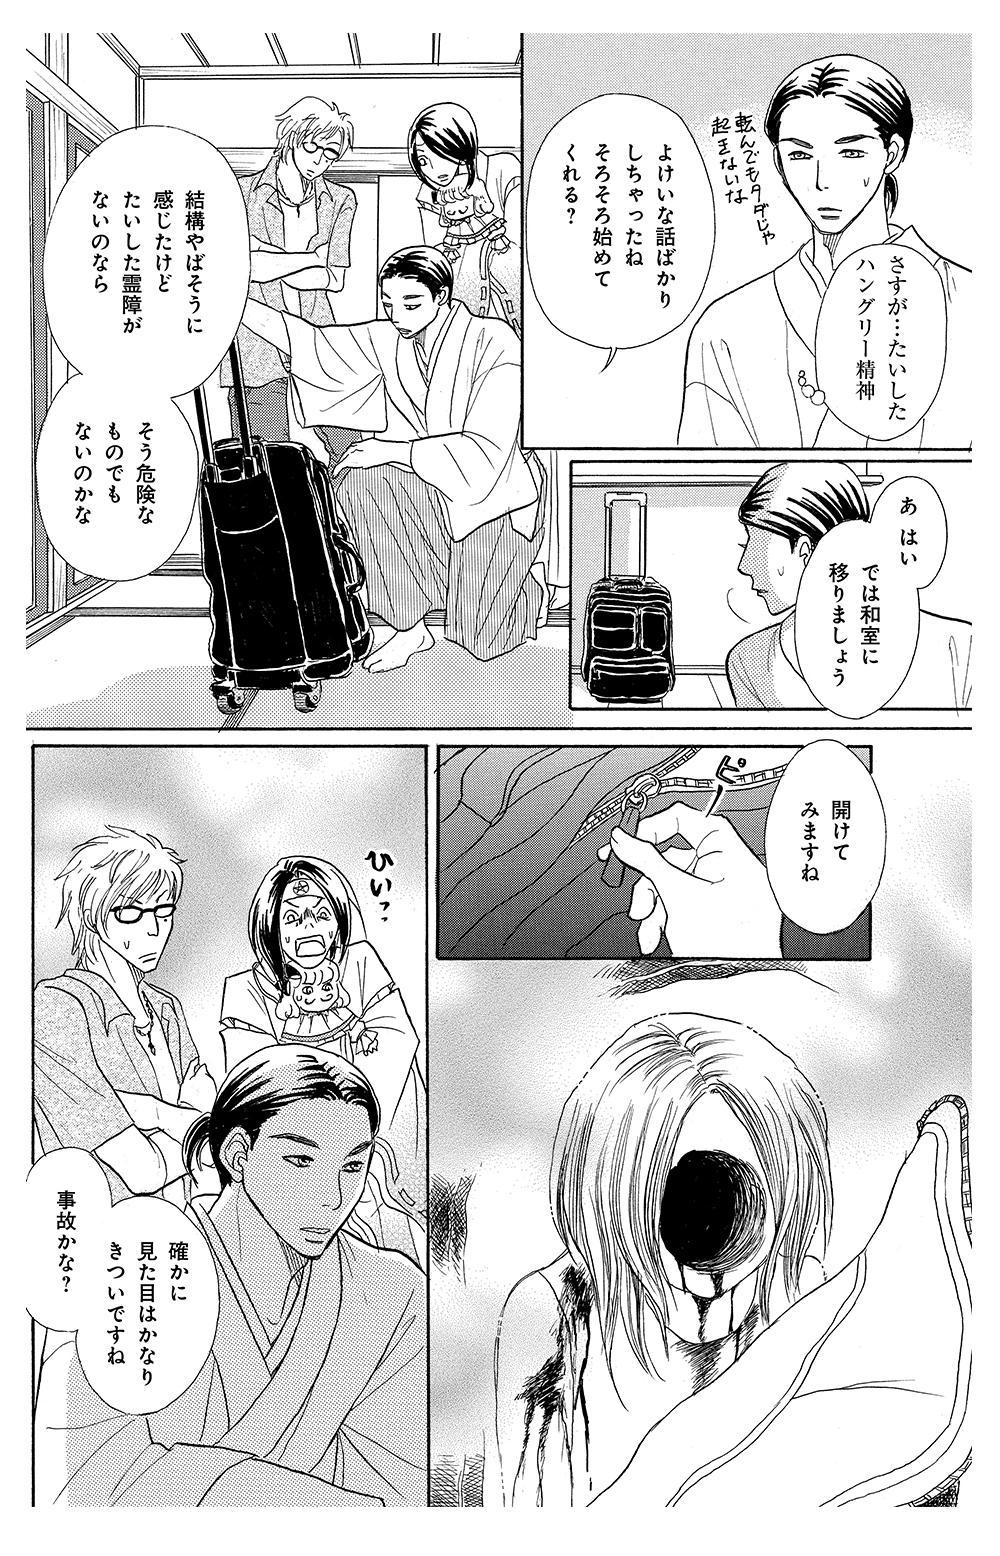 ijyuintukimaru-082.jpg